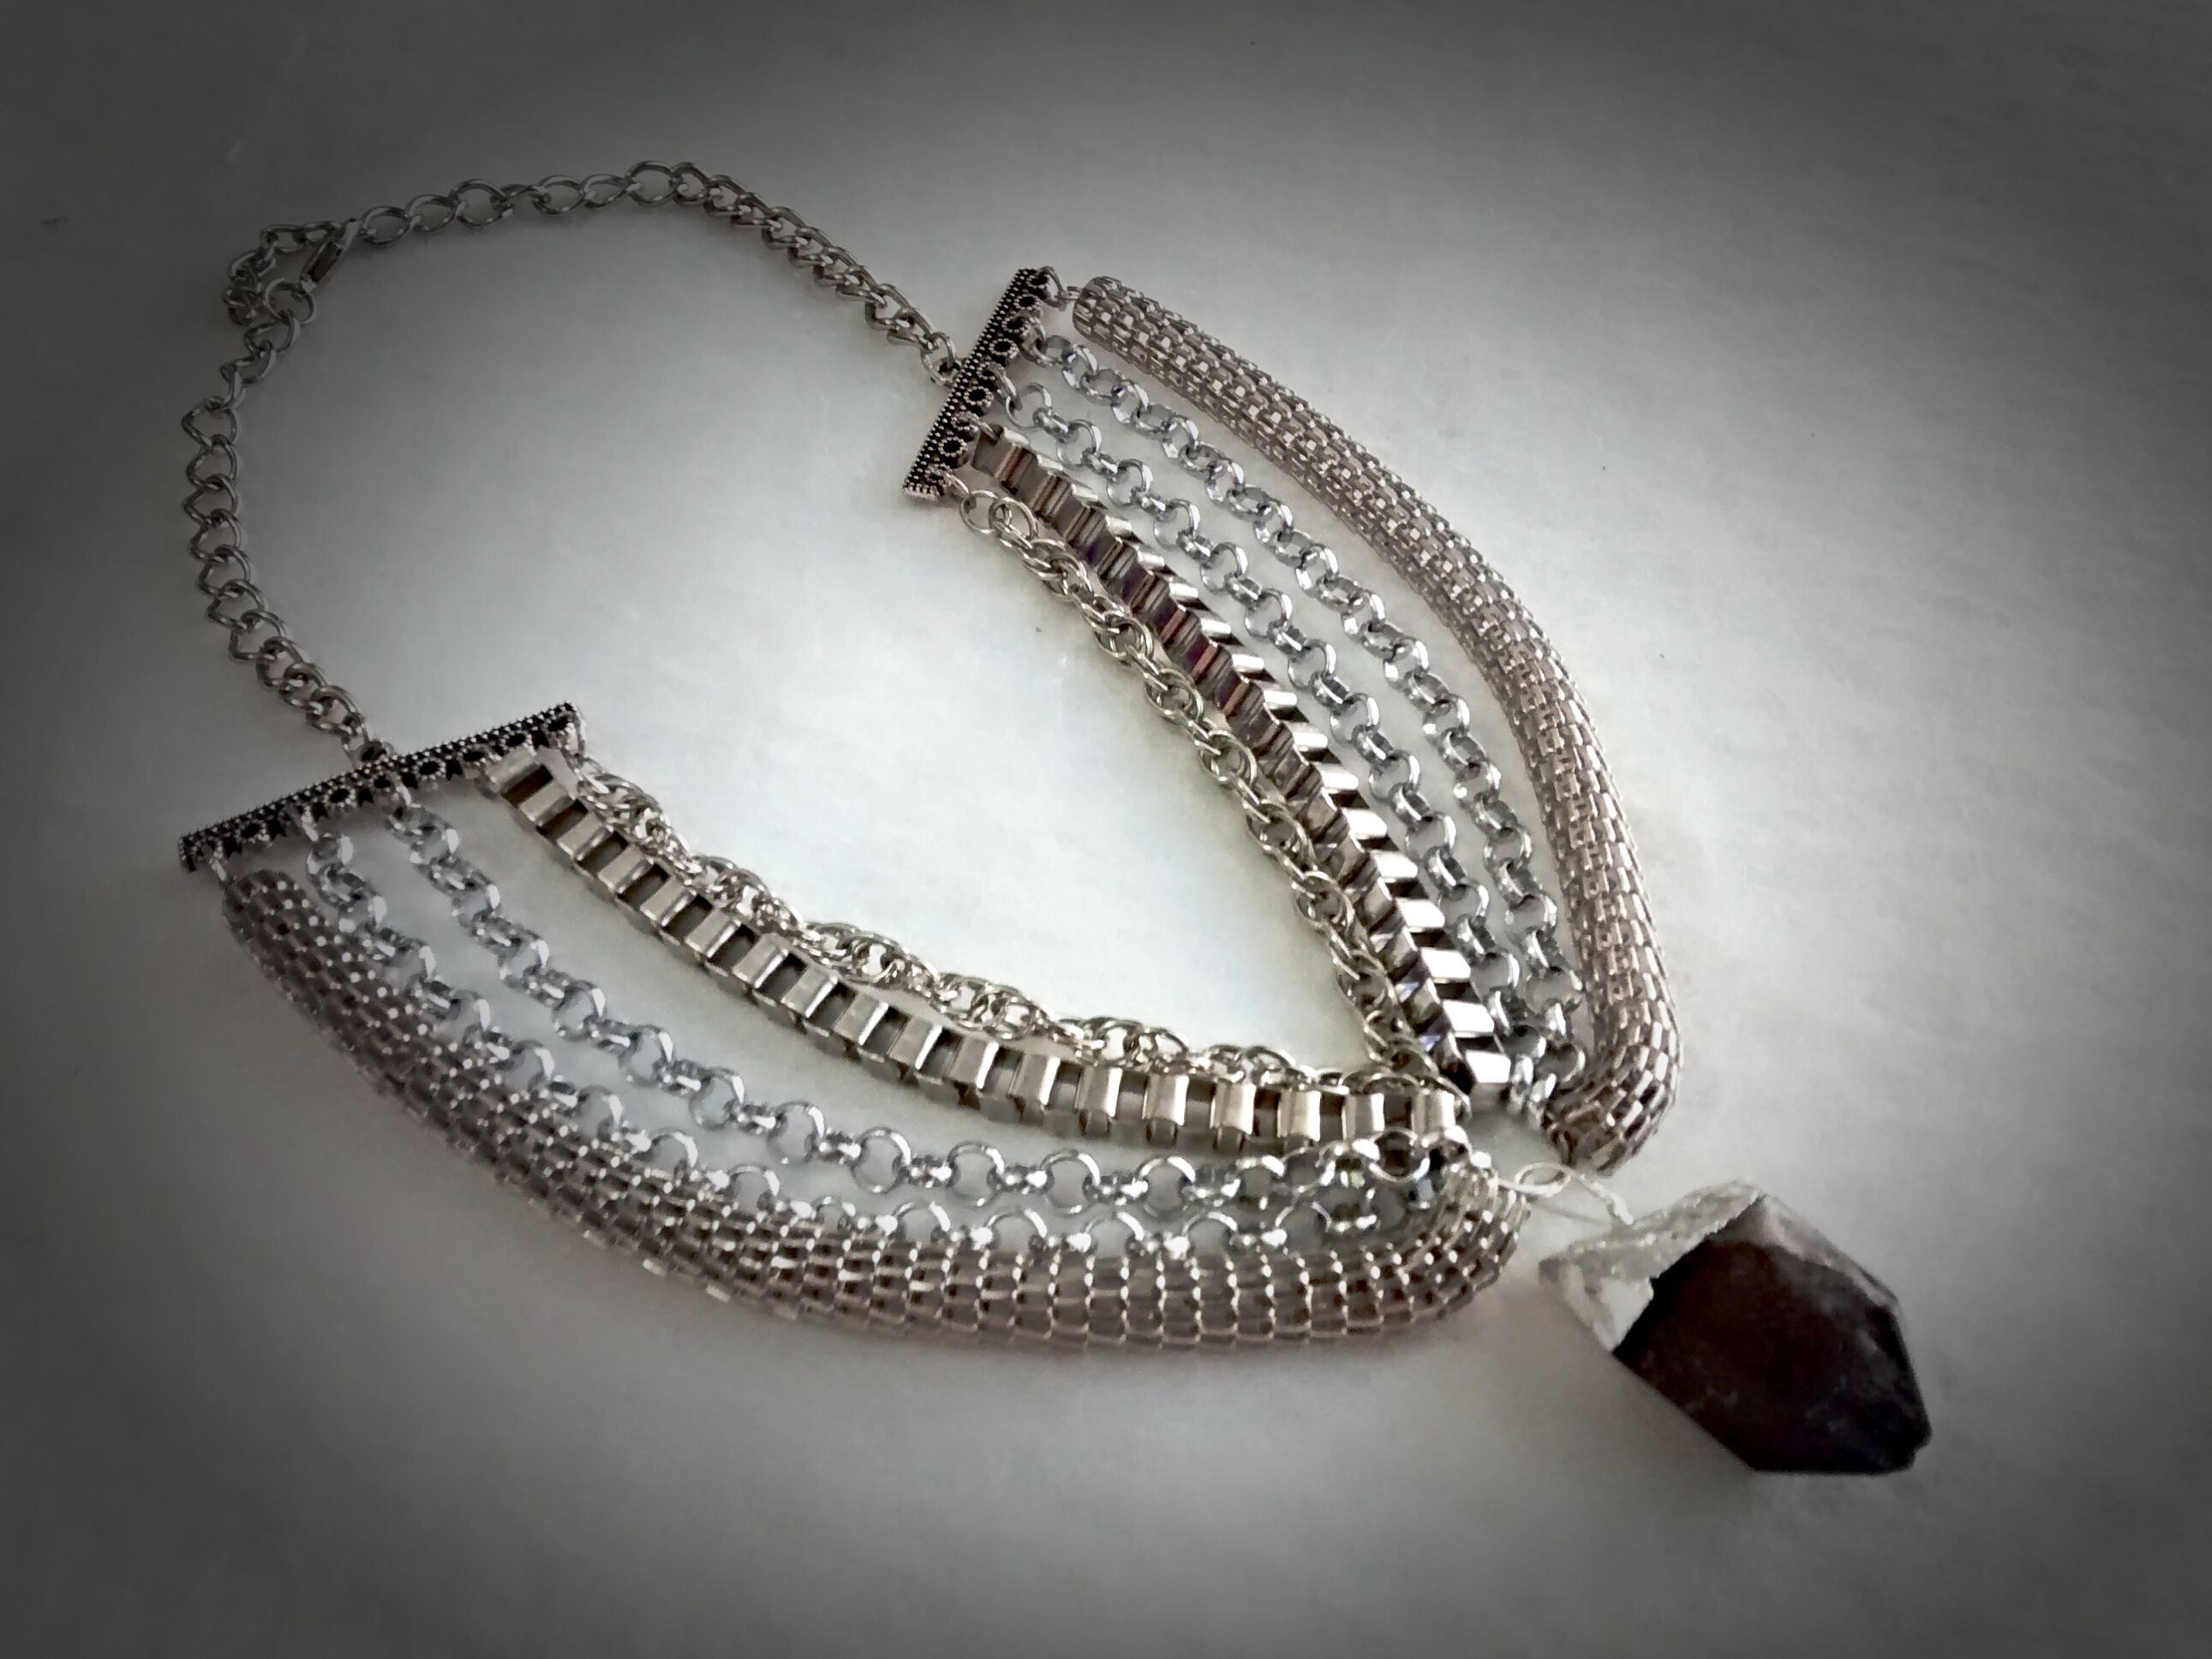 73c4ffdb564f Collar mix de cadenas con piedra negra. SC